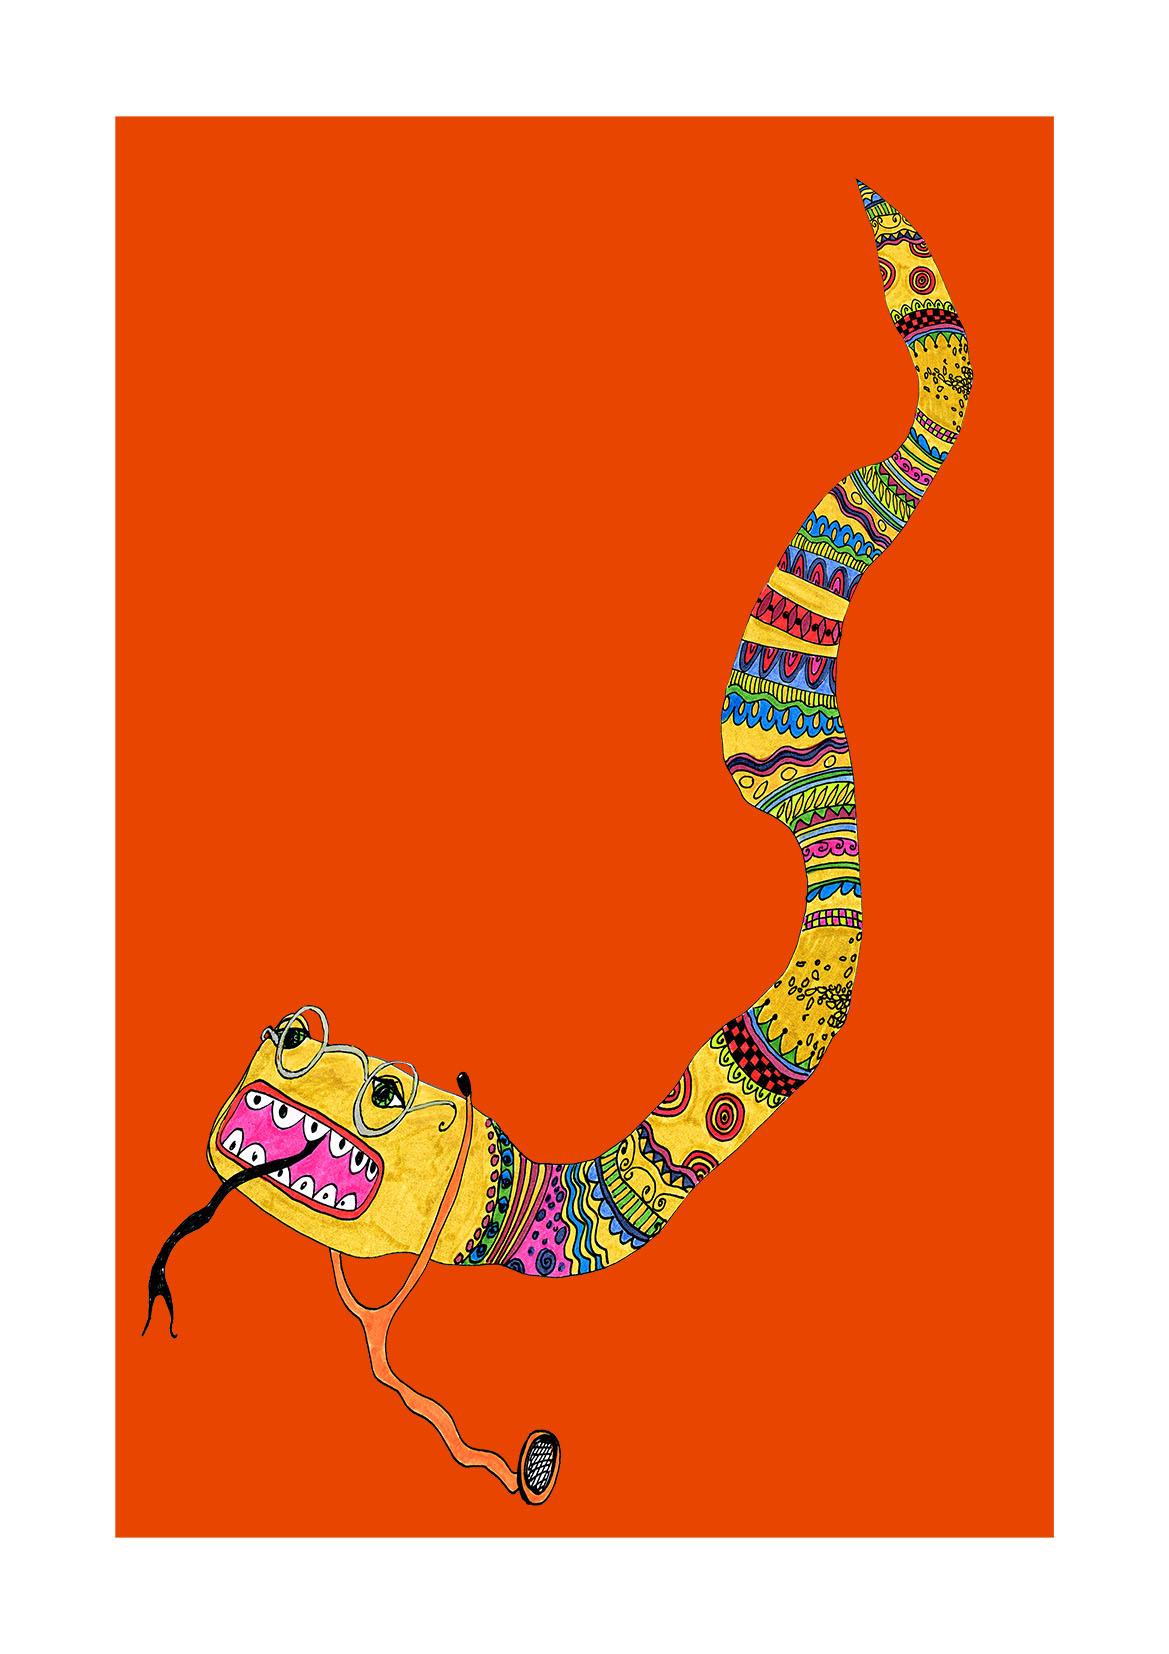 09 corona art print mariska eyck A3 db 086 100 jpeg